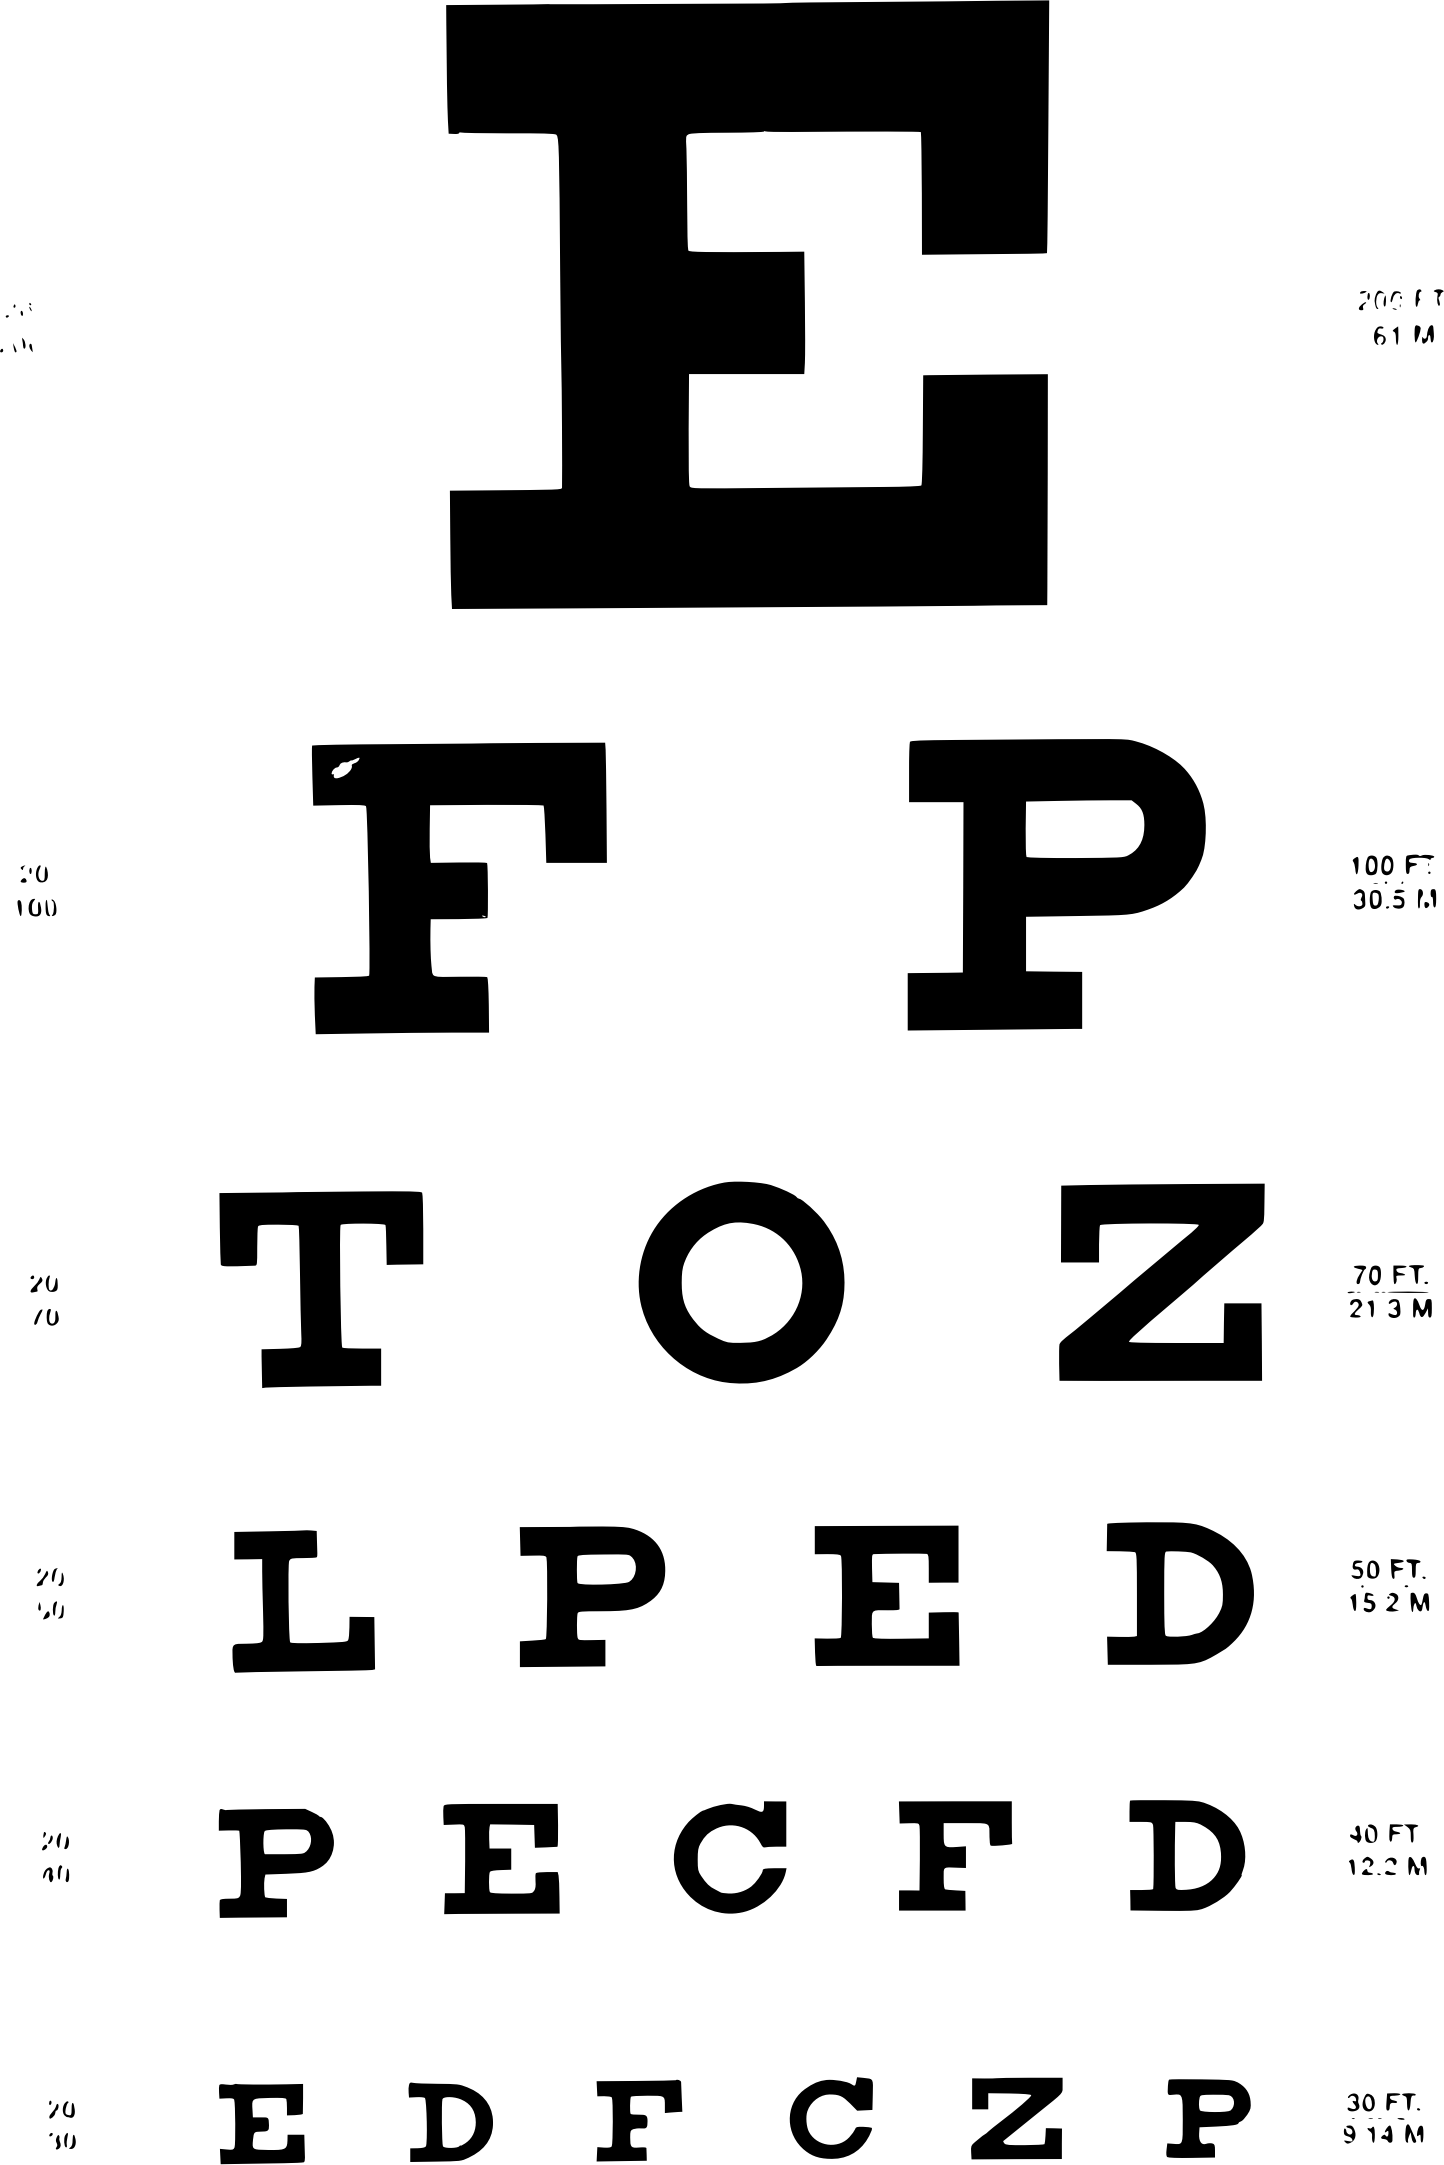 Test clipart english test, Test english test Transparent